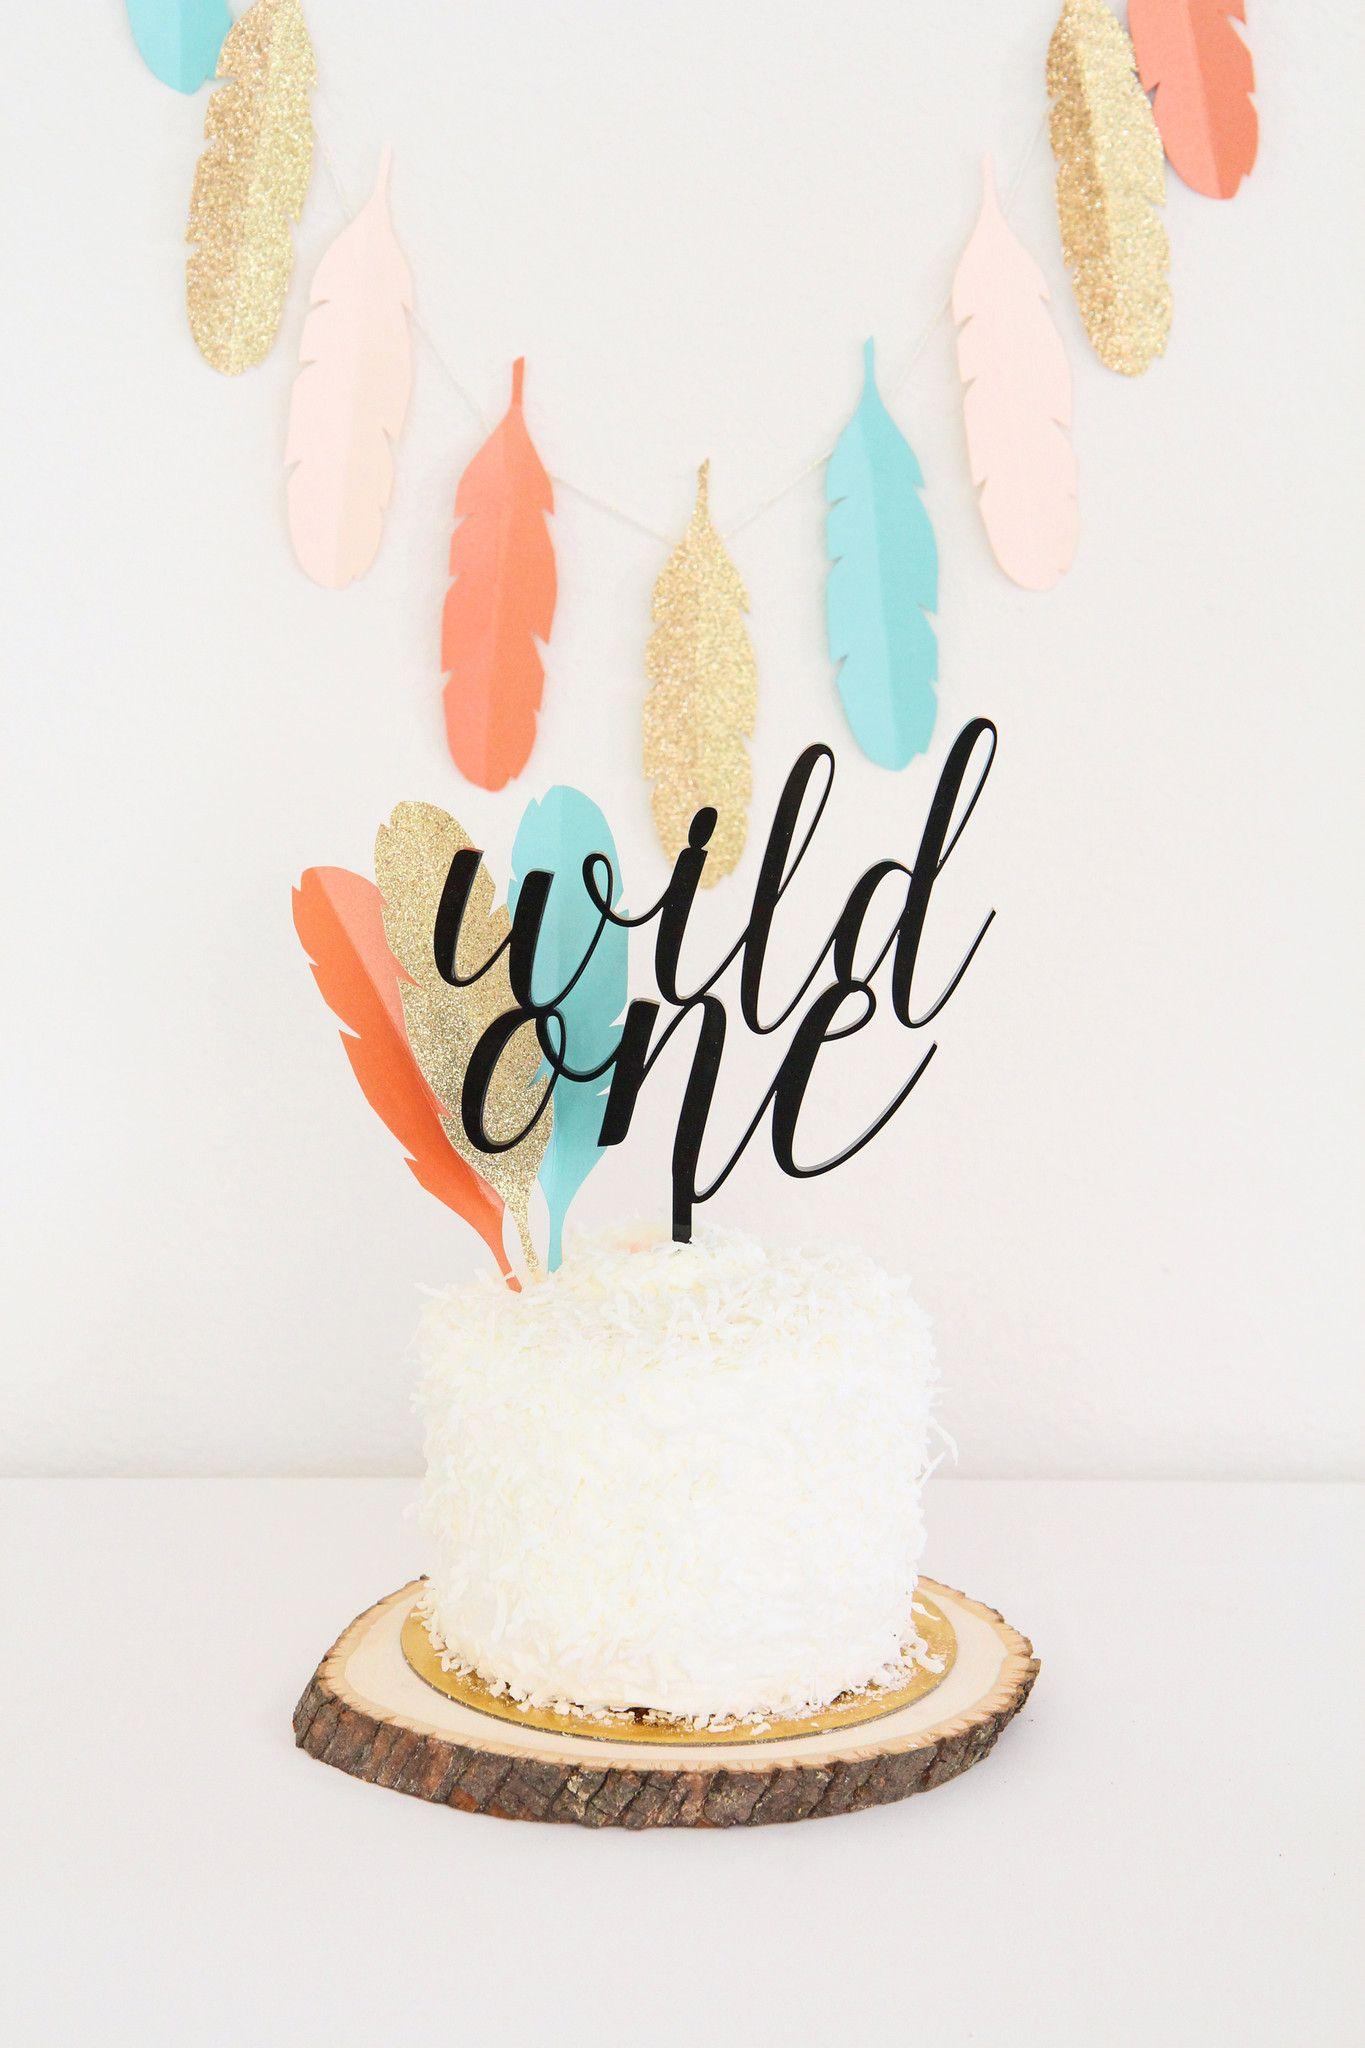 tribal-wild-one-custom-cake-topper-diy-feathers-first-birthday-party-gold-glitter-aqua-turquoise-blue-orange-peach-black-sweet-paper-shop_2048x2048